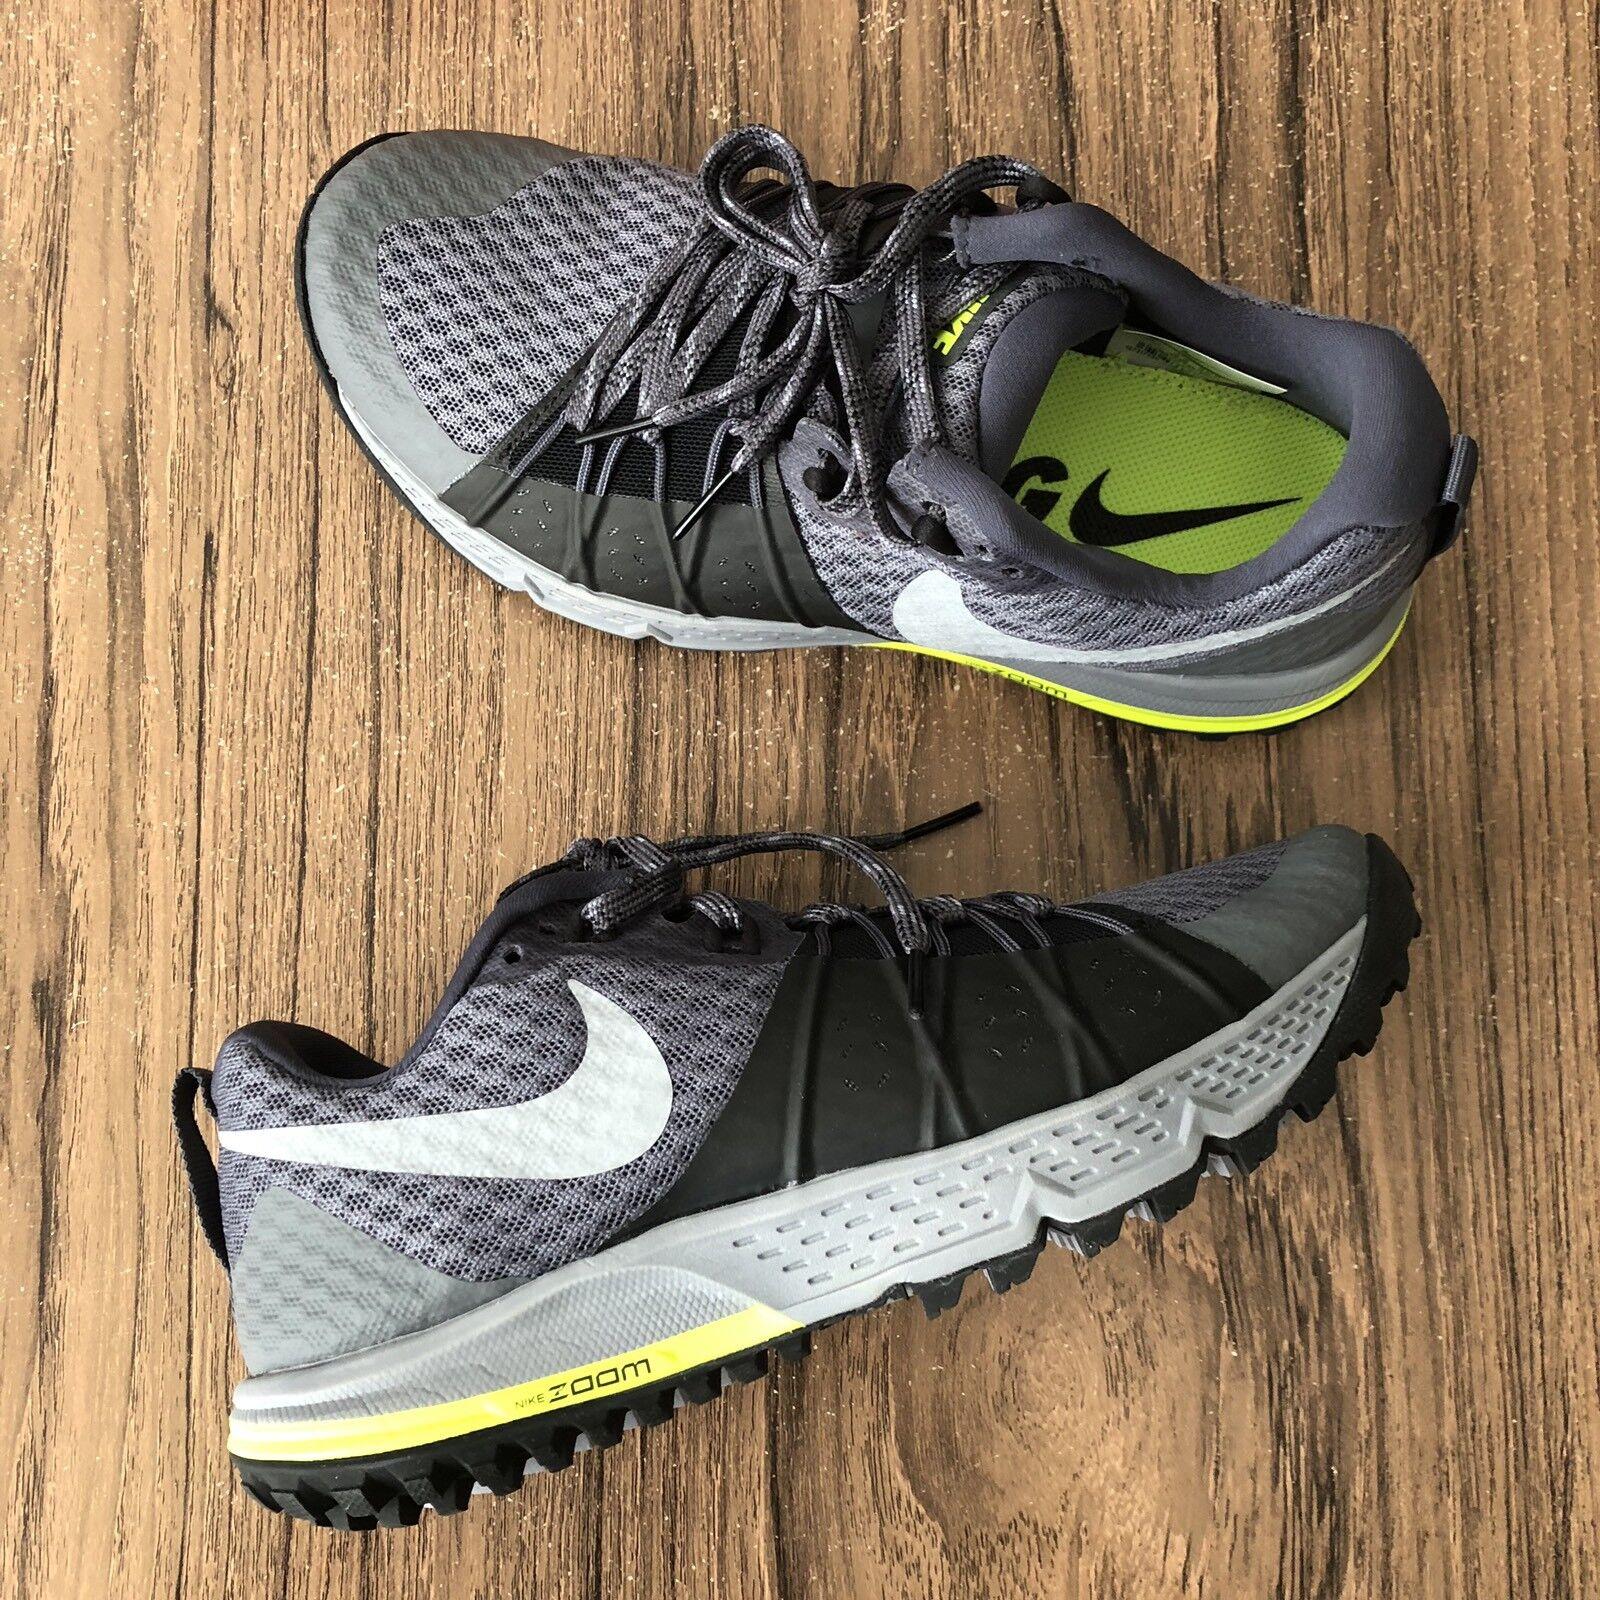 A859G A859G A859G Nike Air Zoom Wildhäst 4 88565 -001 Trail skor herr Storlek 6 (kvinnor 7.5)  80% rabatt